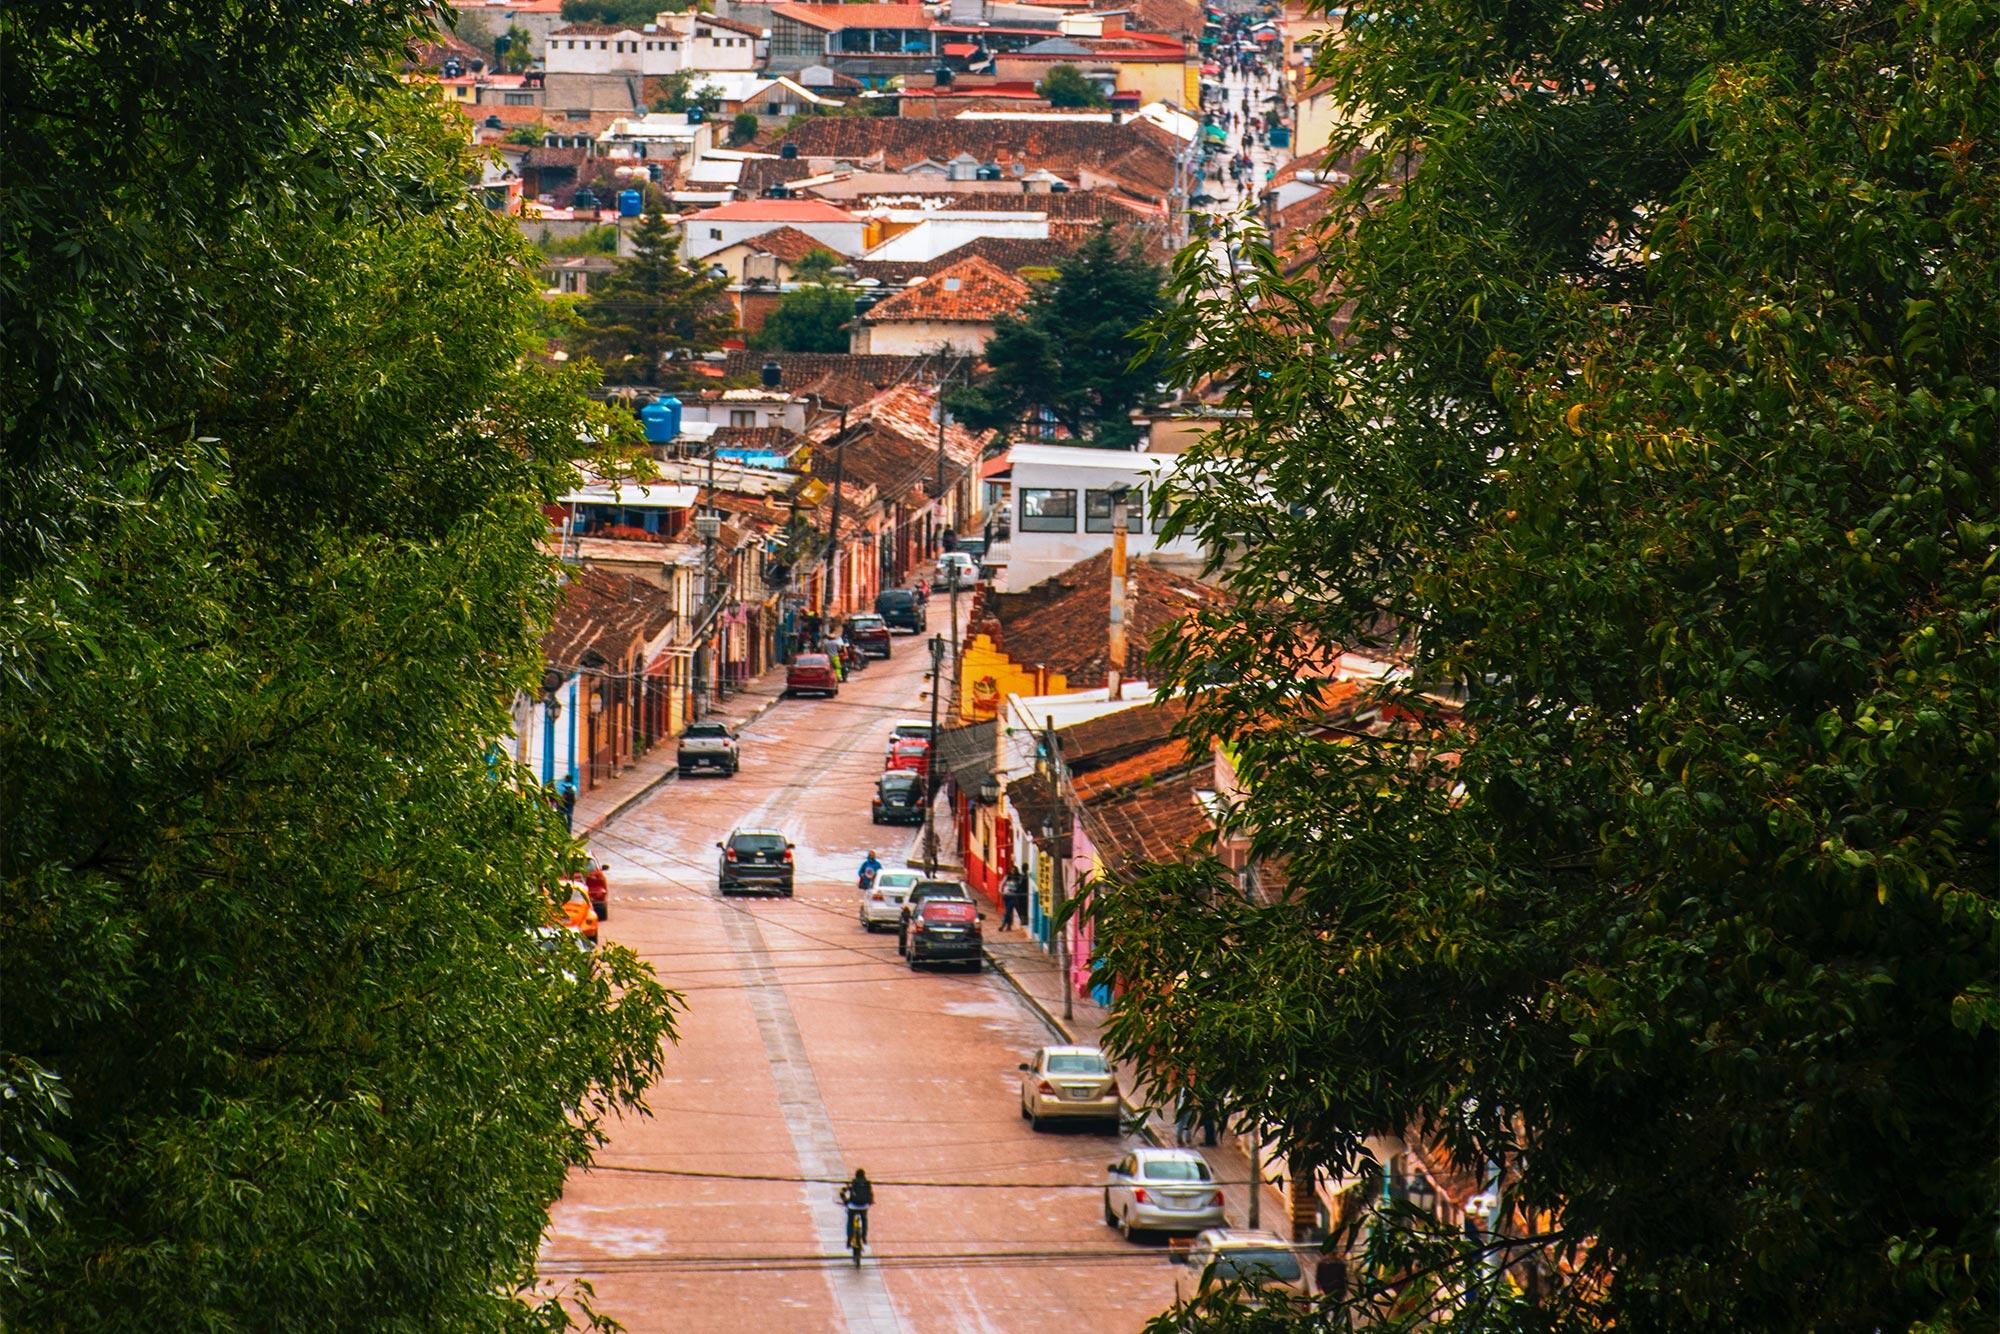 The Road Less Traveled: San Cristóbal de las Casas, Mexico